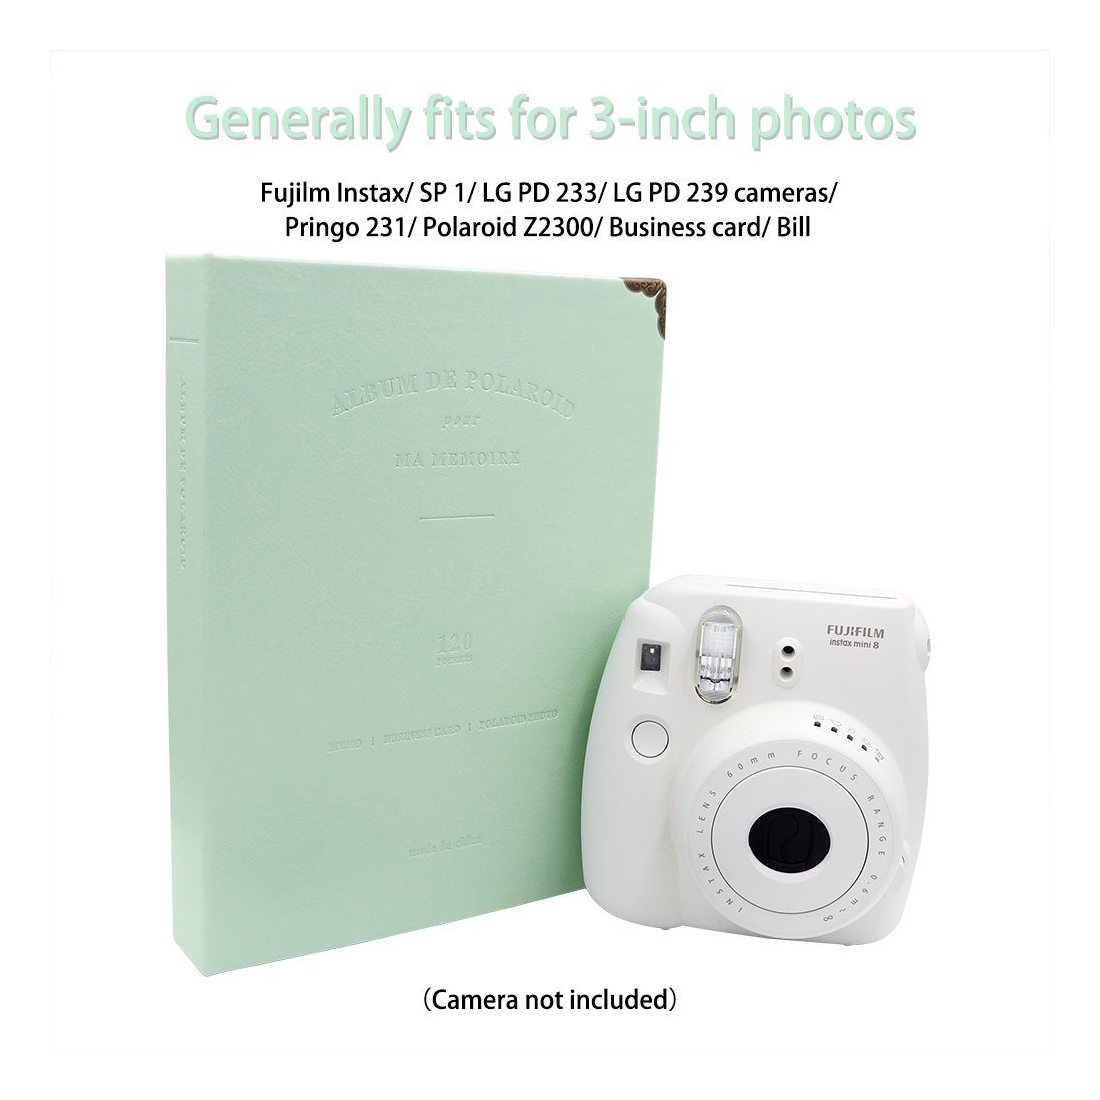 Ablus Store 120poches Mini album photo pour Fujifilm Instax Mini 7S 88+ 92526années 507090appareil photo instantané